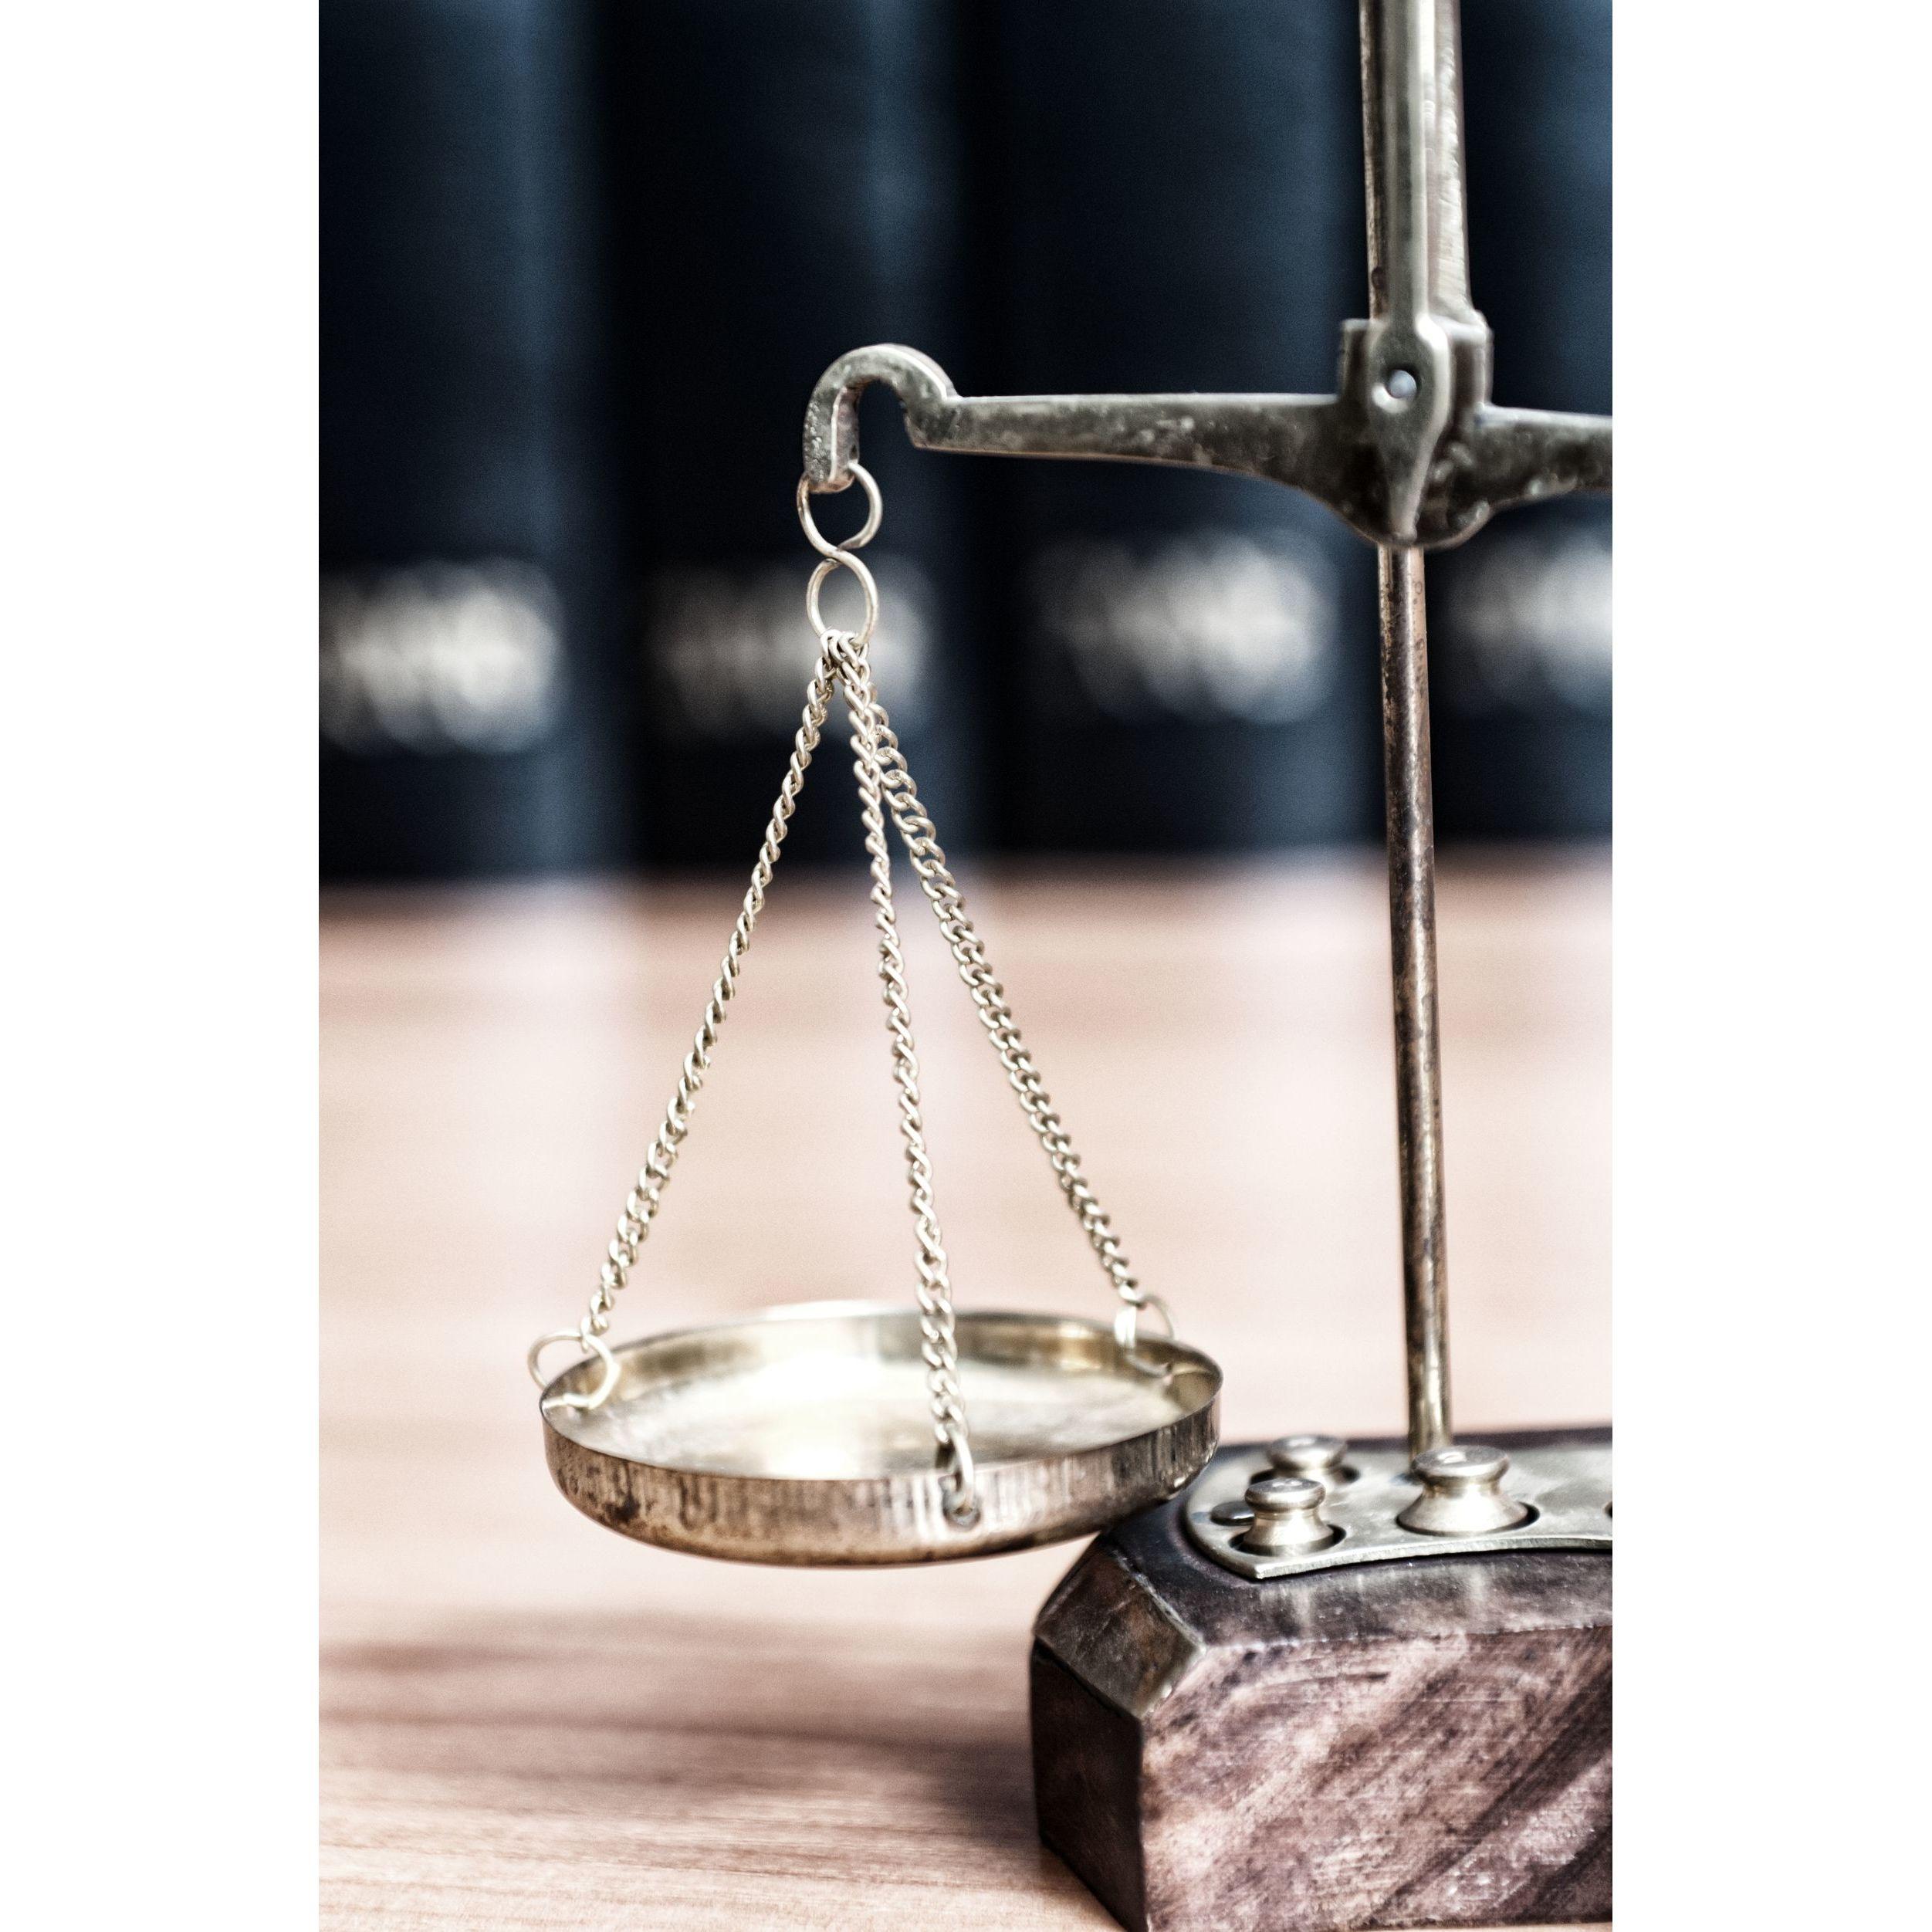 John Christy Attorney at Law